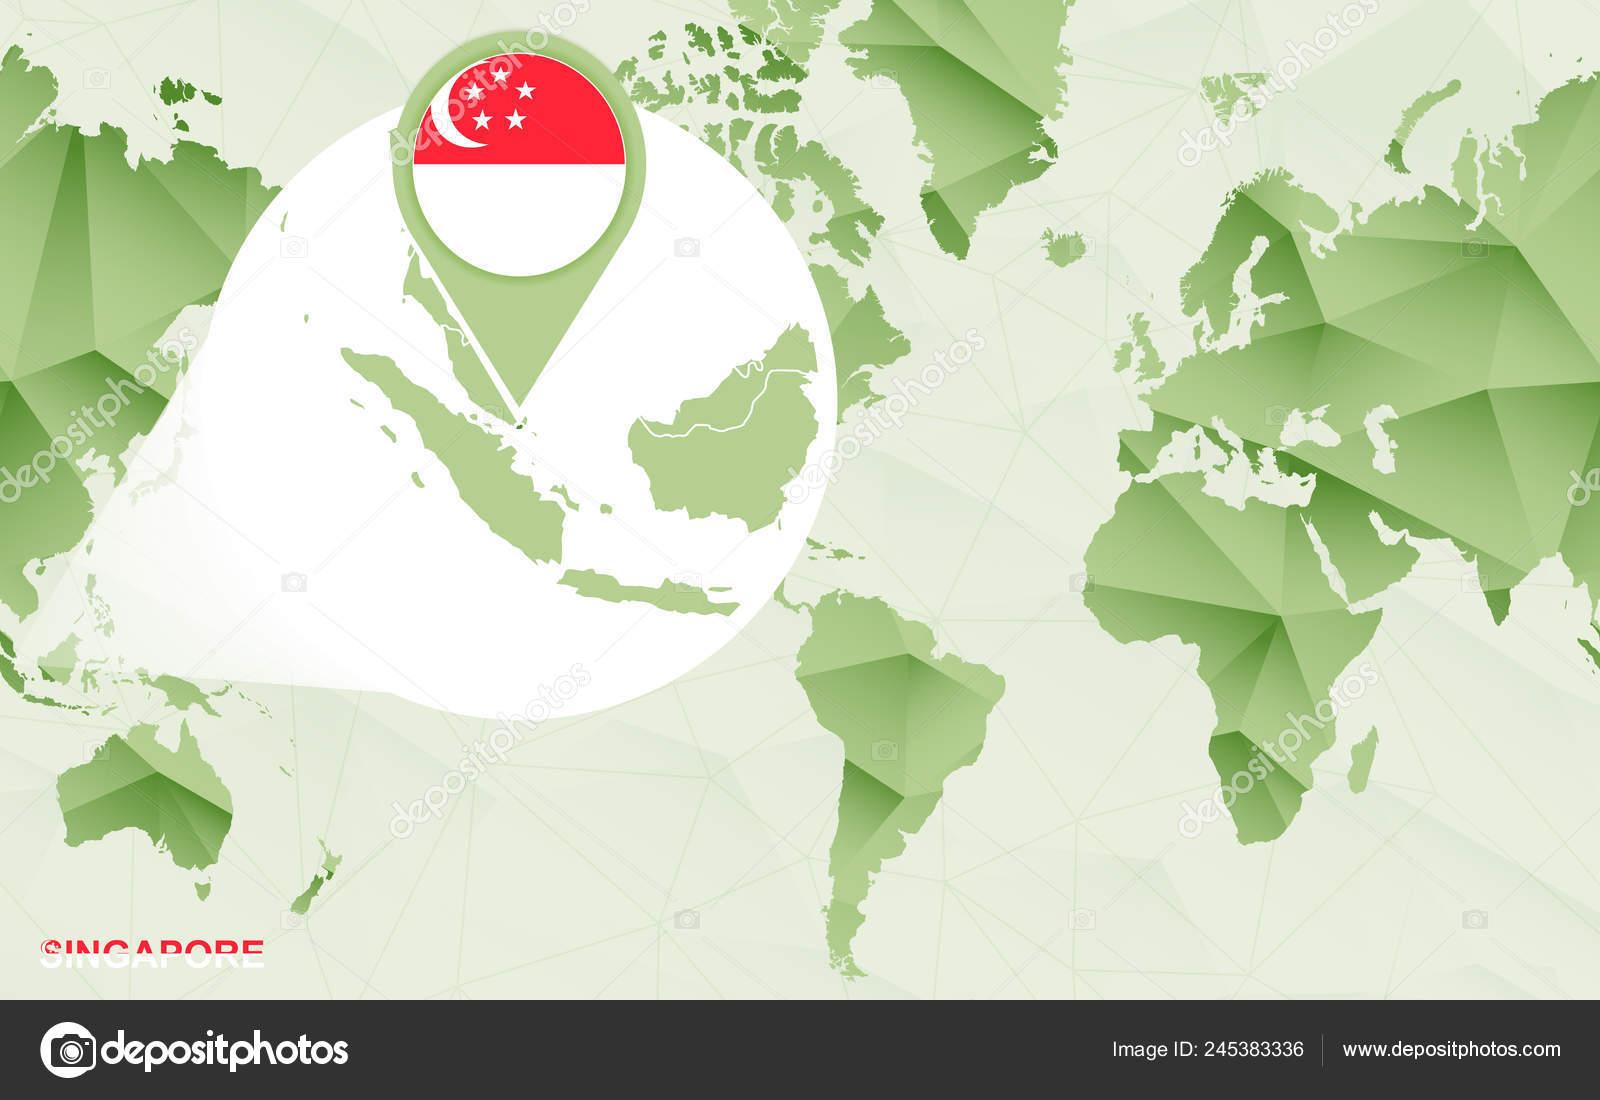 America centric world map | America Centric World Map ...